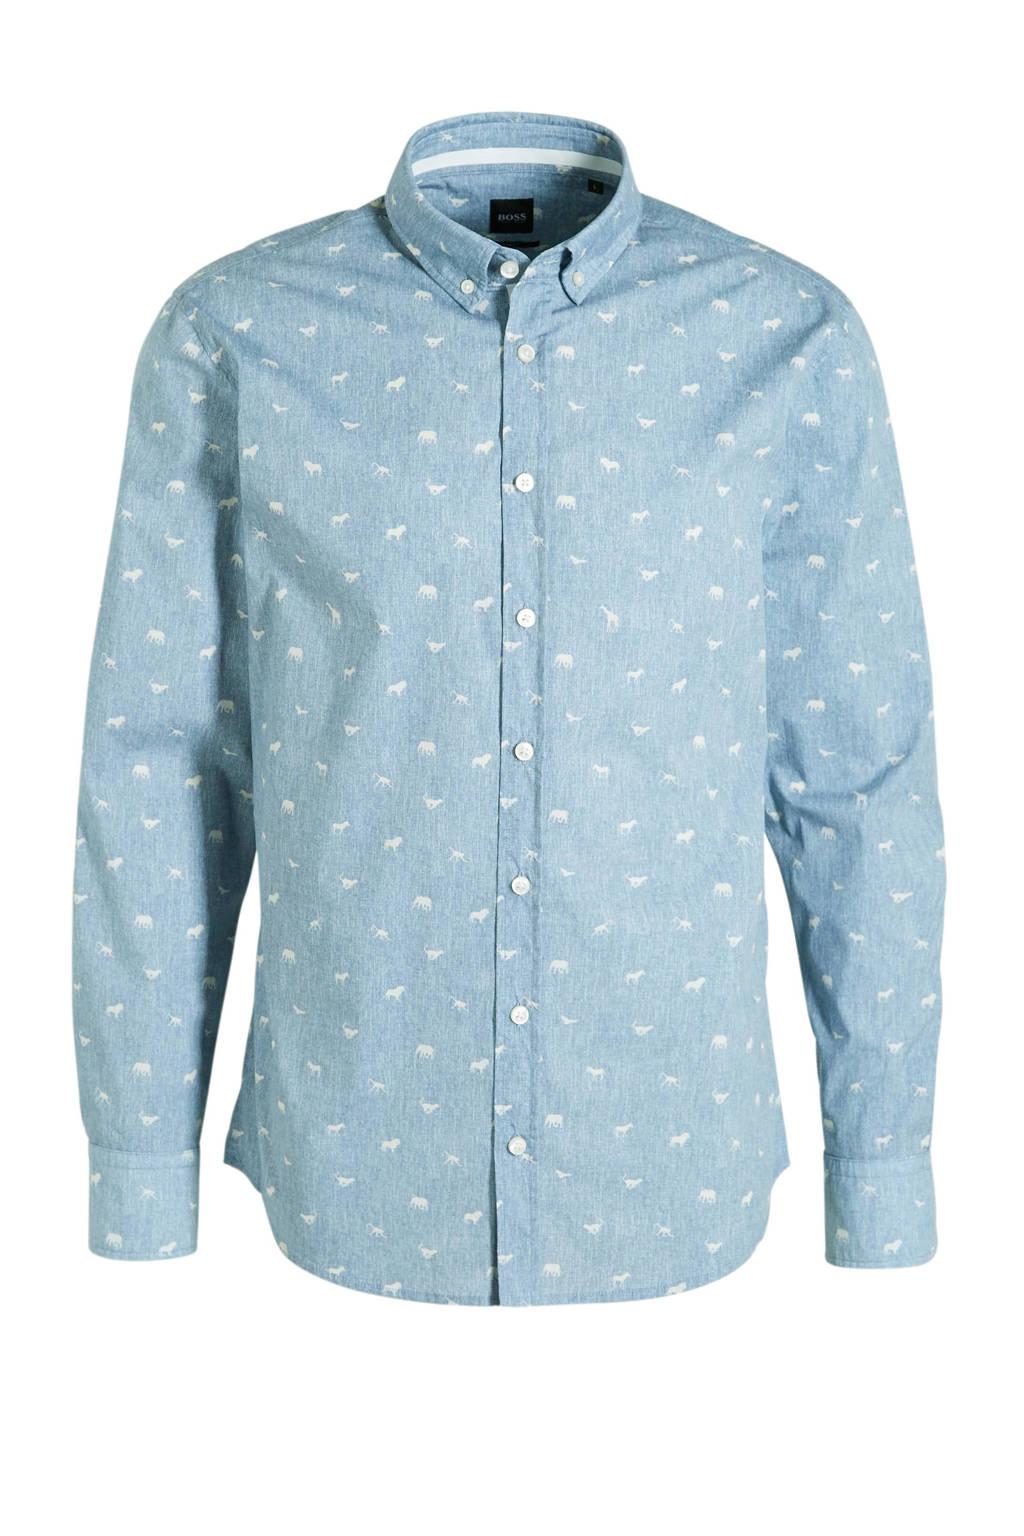 BOSS Casual slim fit overhemd met all over print blauw, Blauw